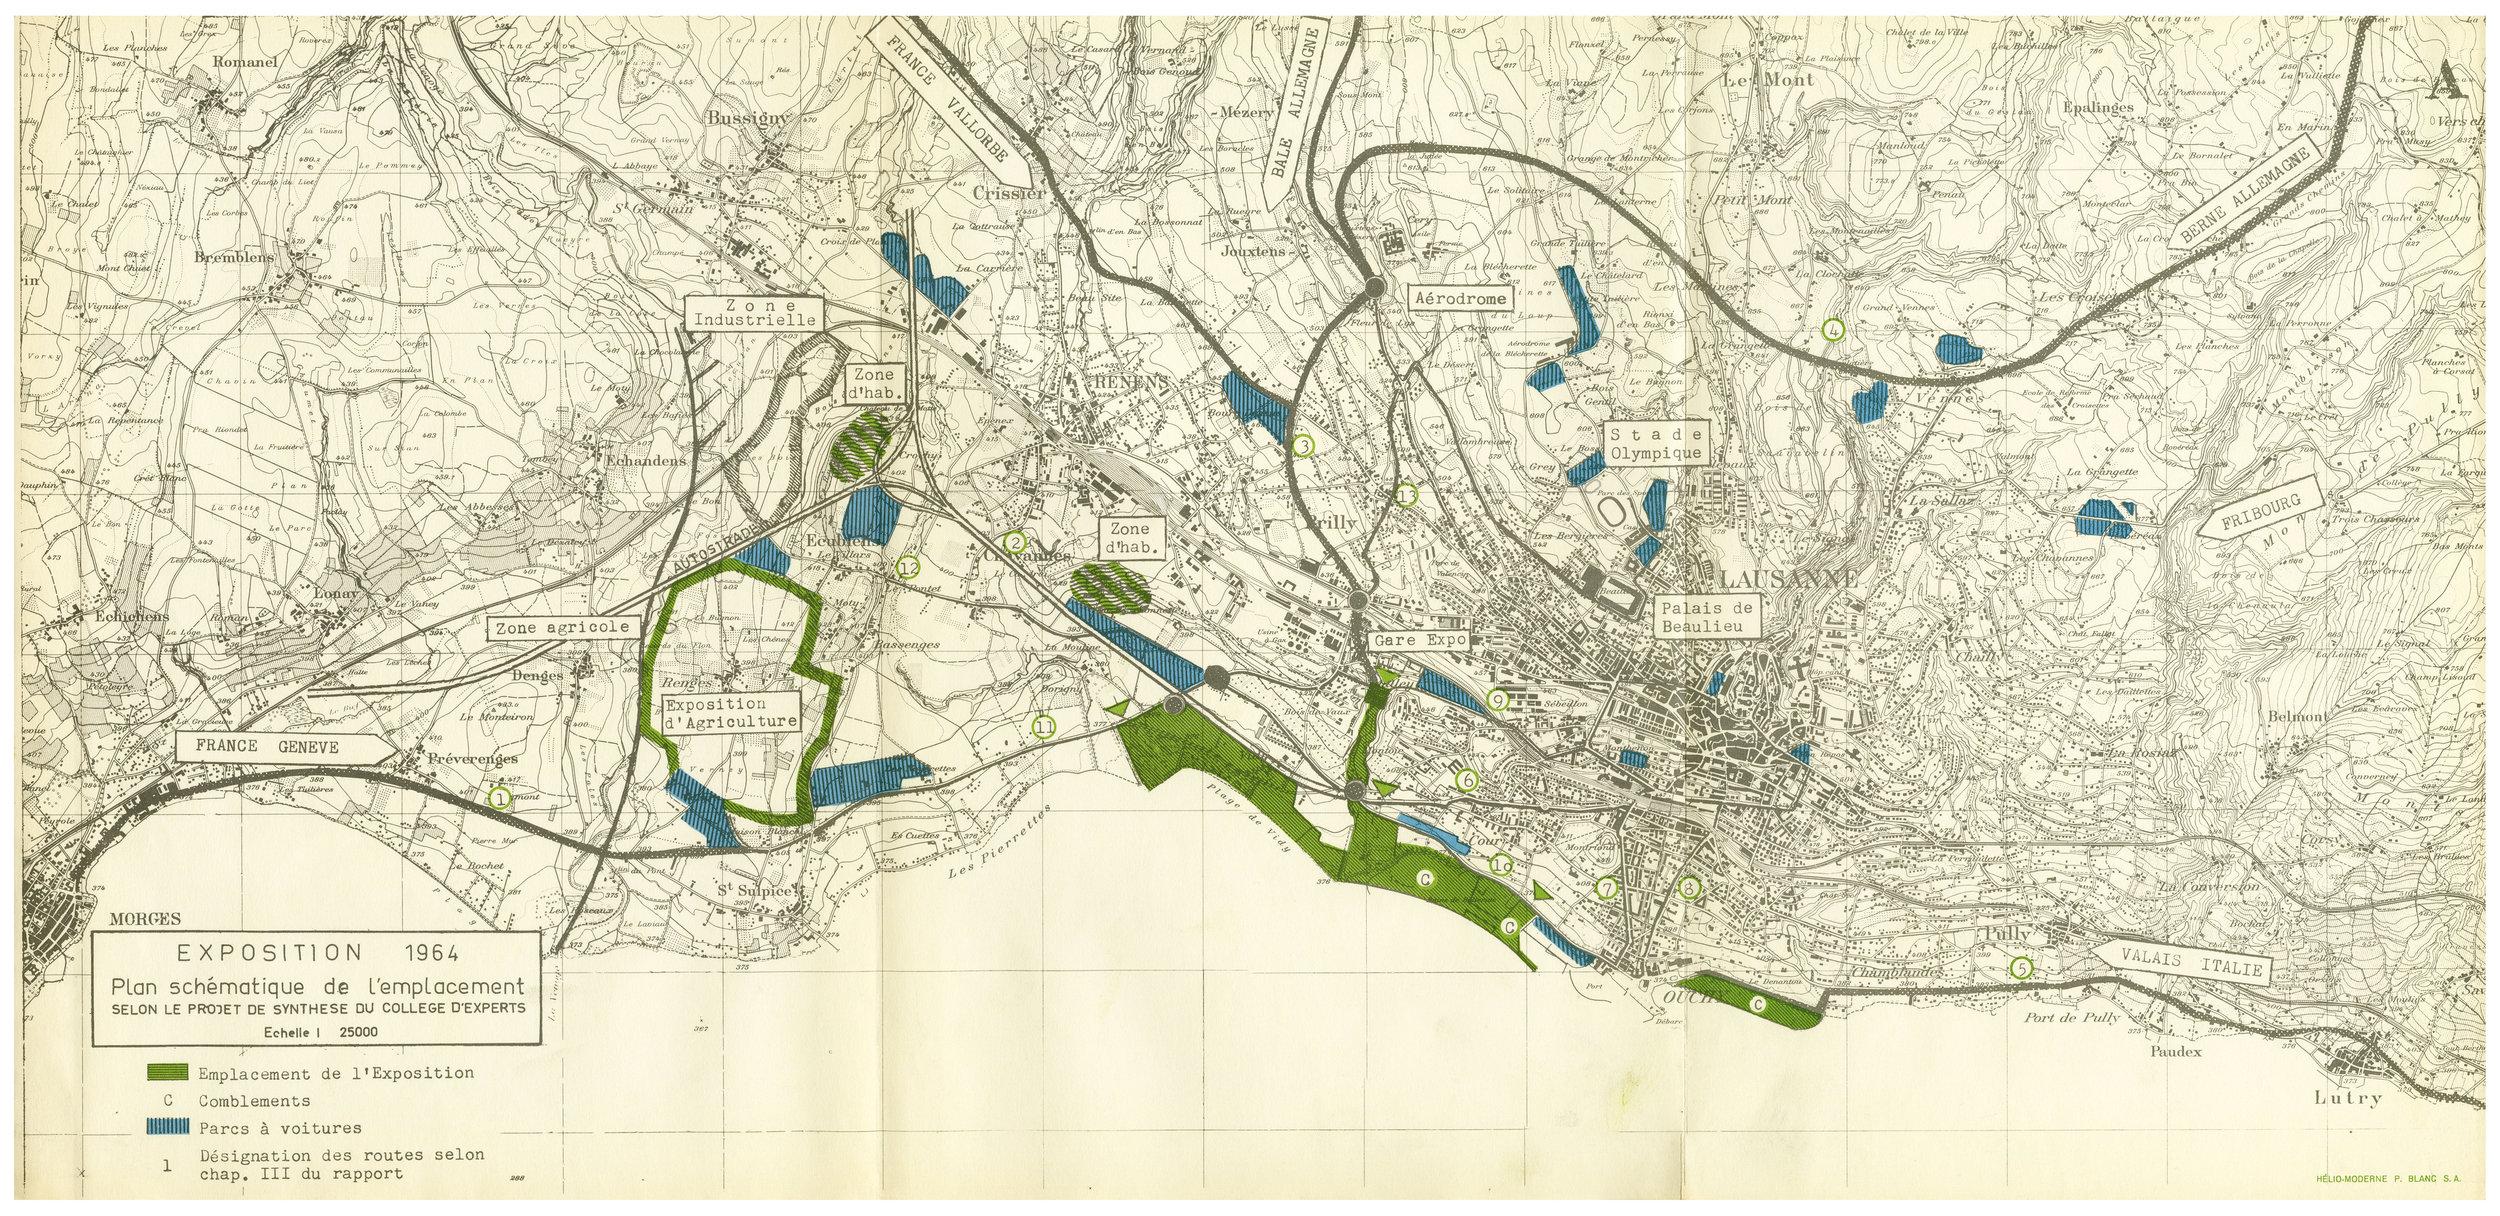 1964_expo plan-print.jpg